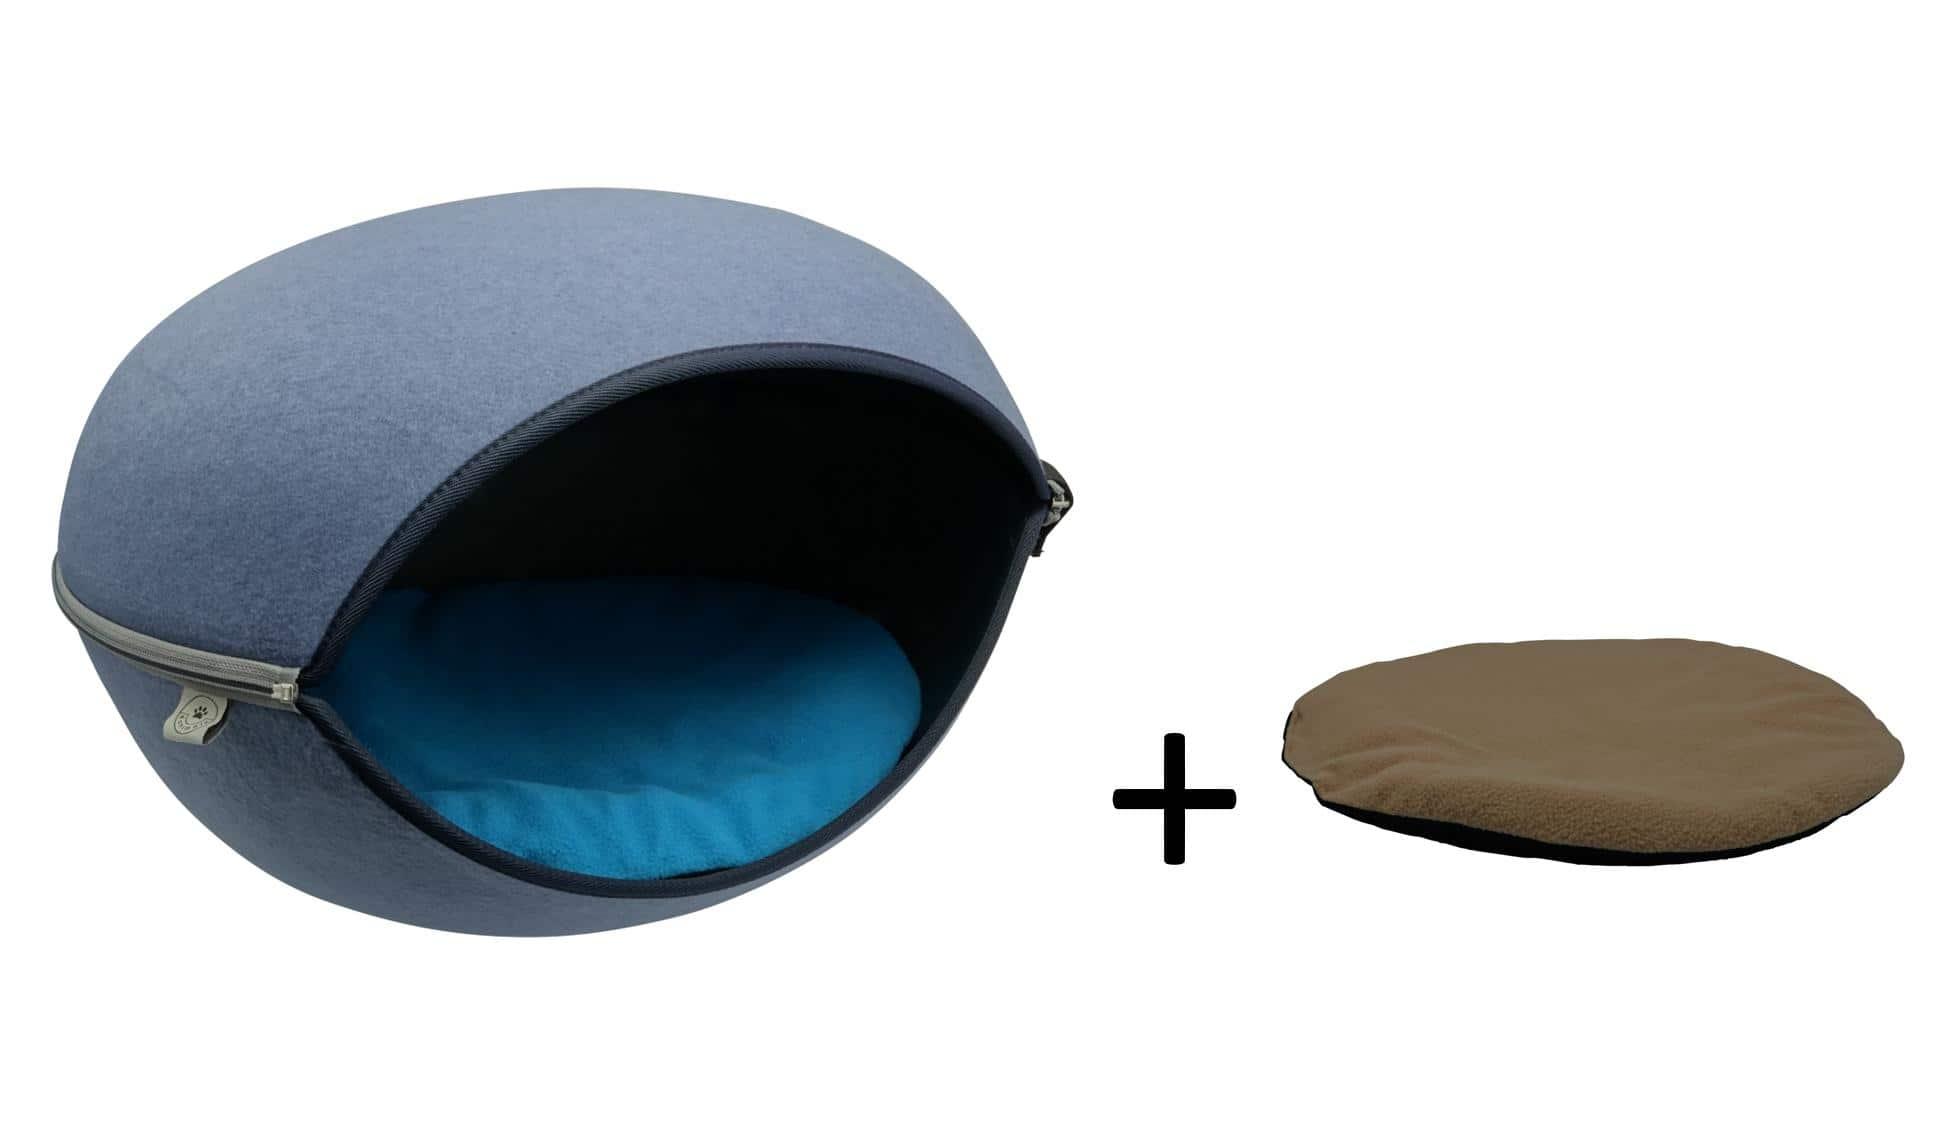 4animalz grote vilten kattenmand in Blauw - 52x45x33cm - blauw/beige